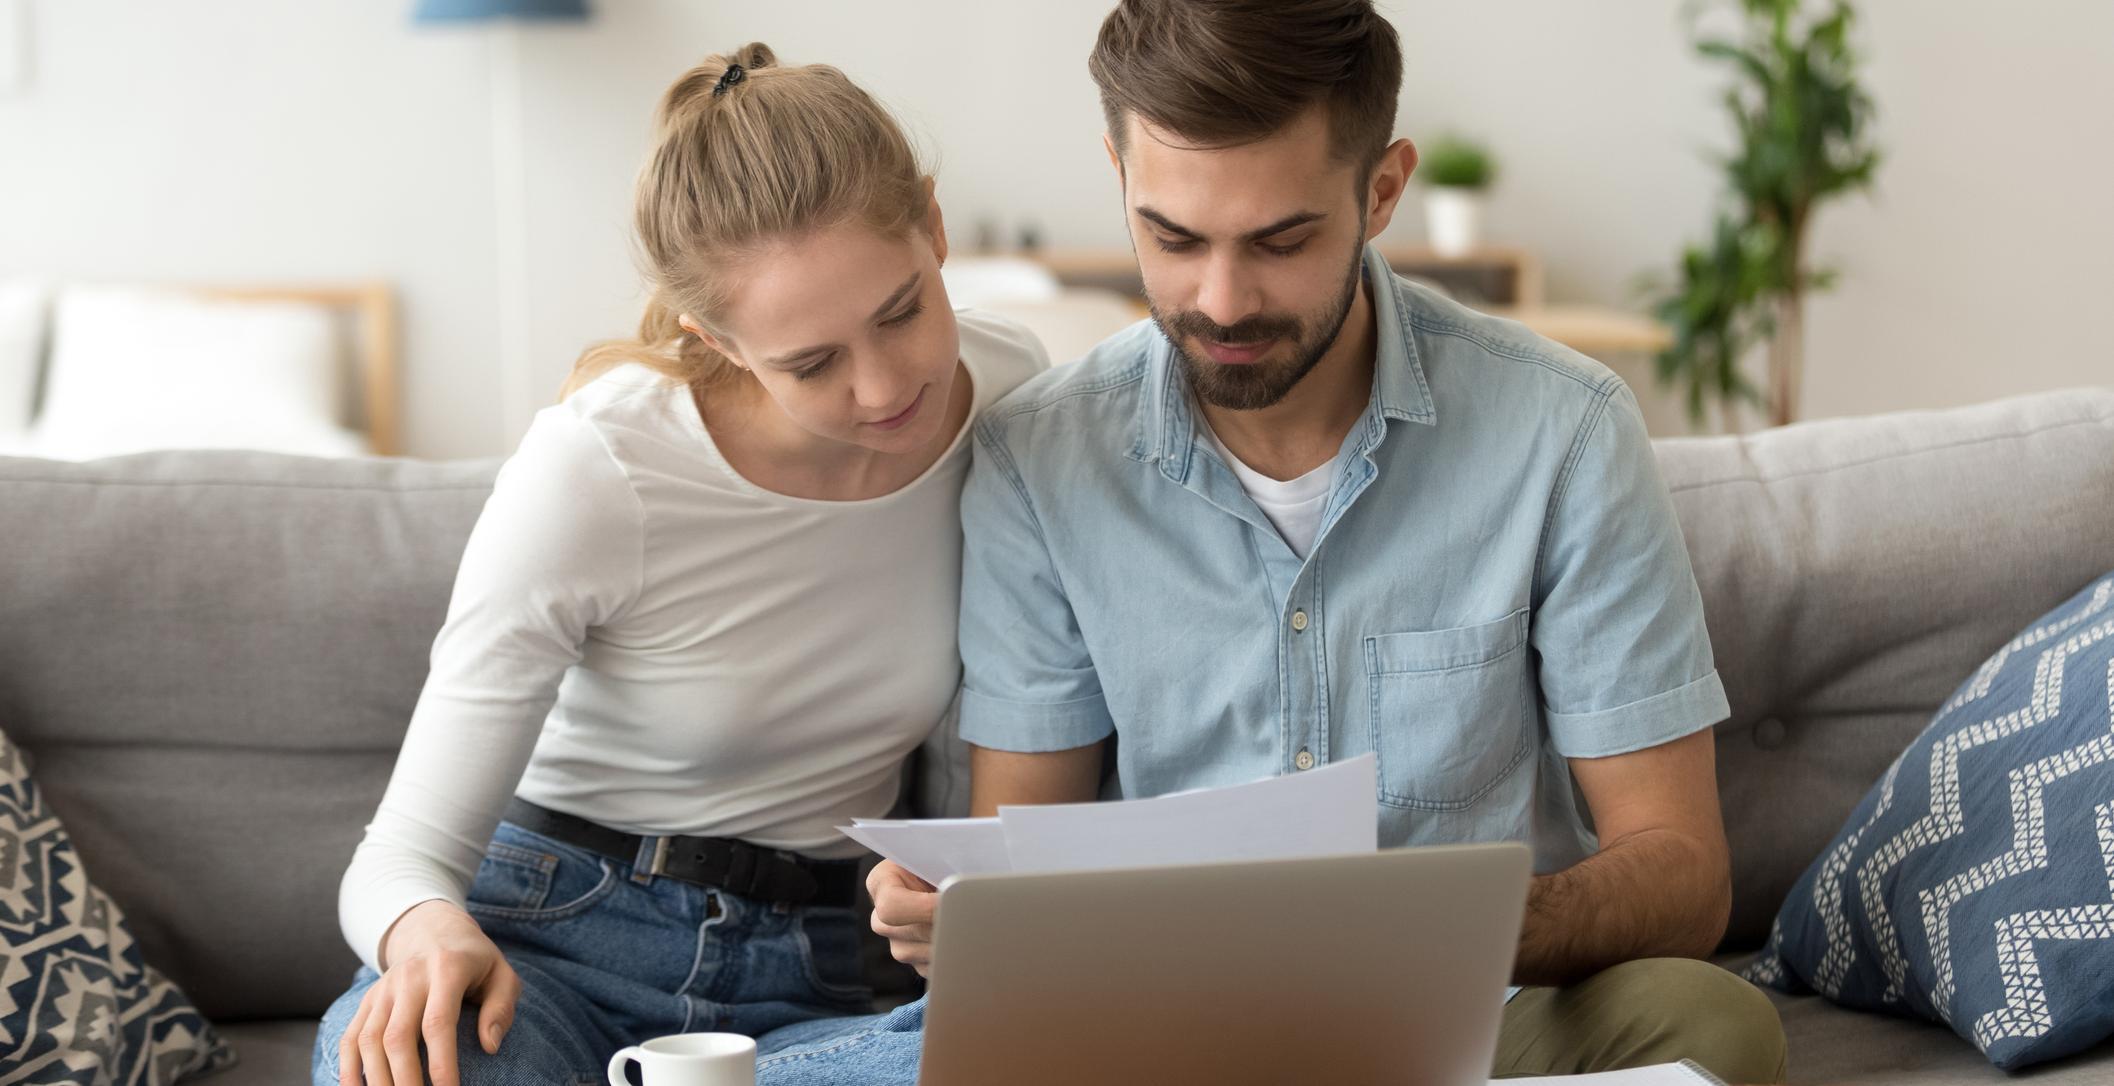 6 Helpful Budgeting Tips